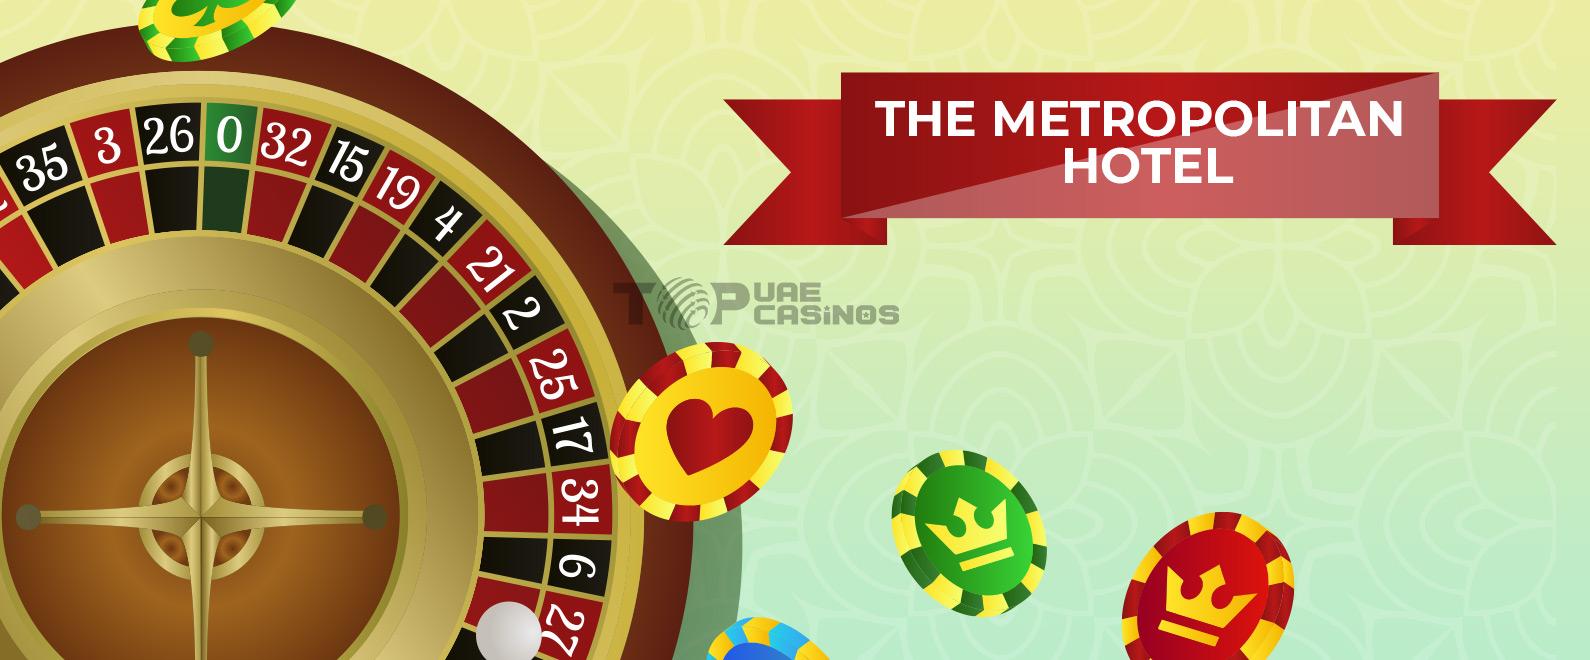 metropolitan hotel dubai casino